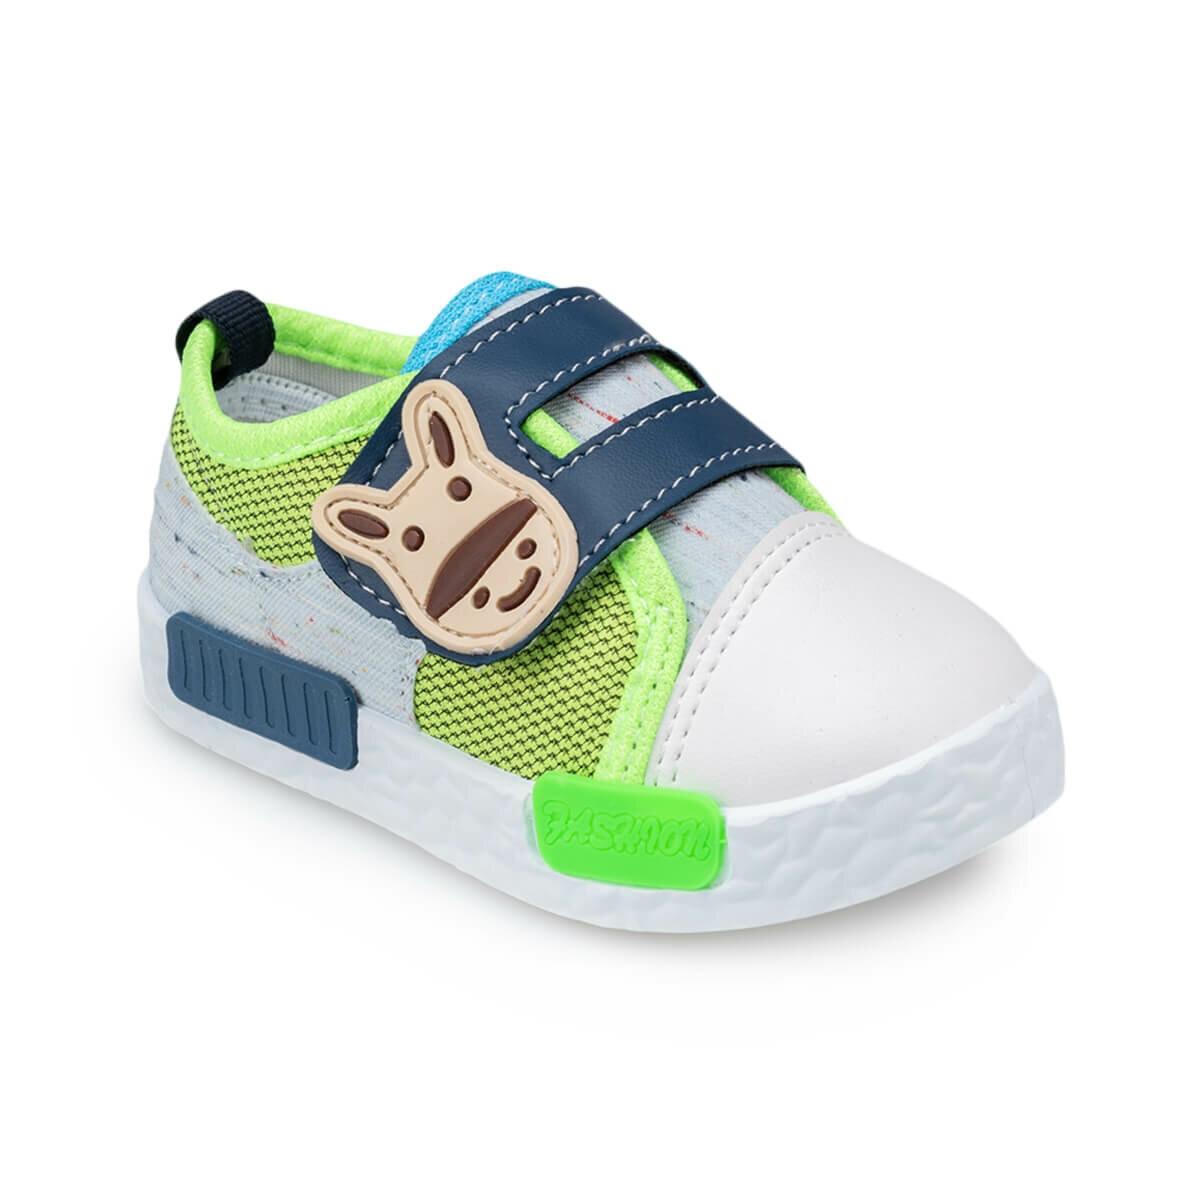 FLO 91. 510176.I Green Male Child Sneaker Shoes Polaris